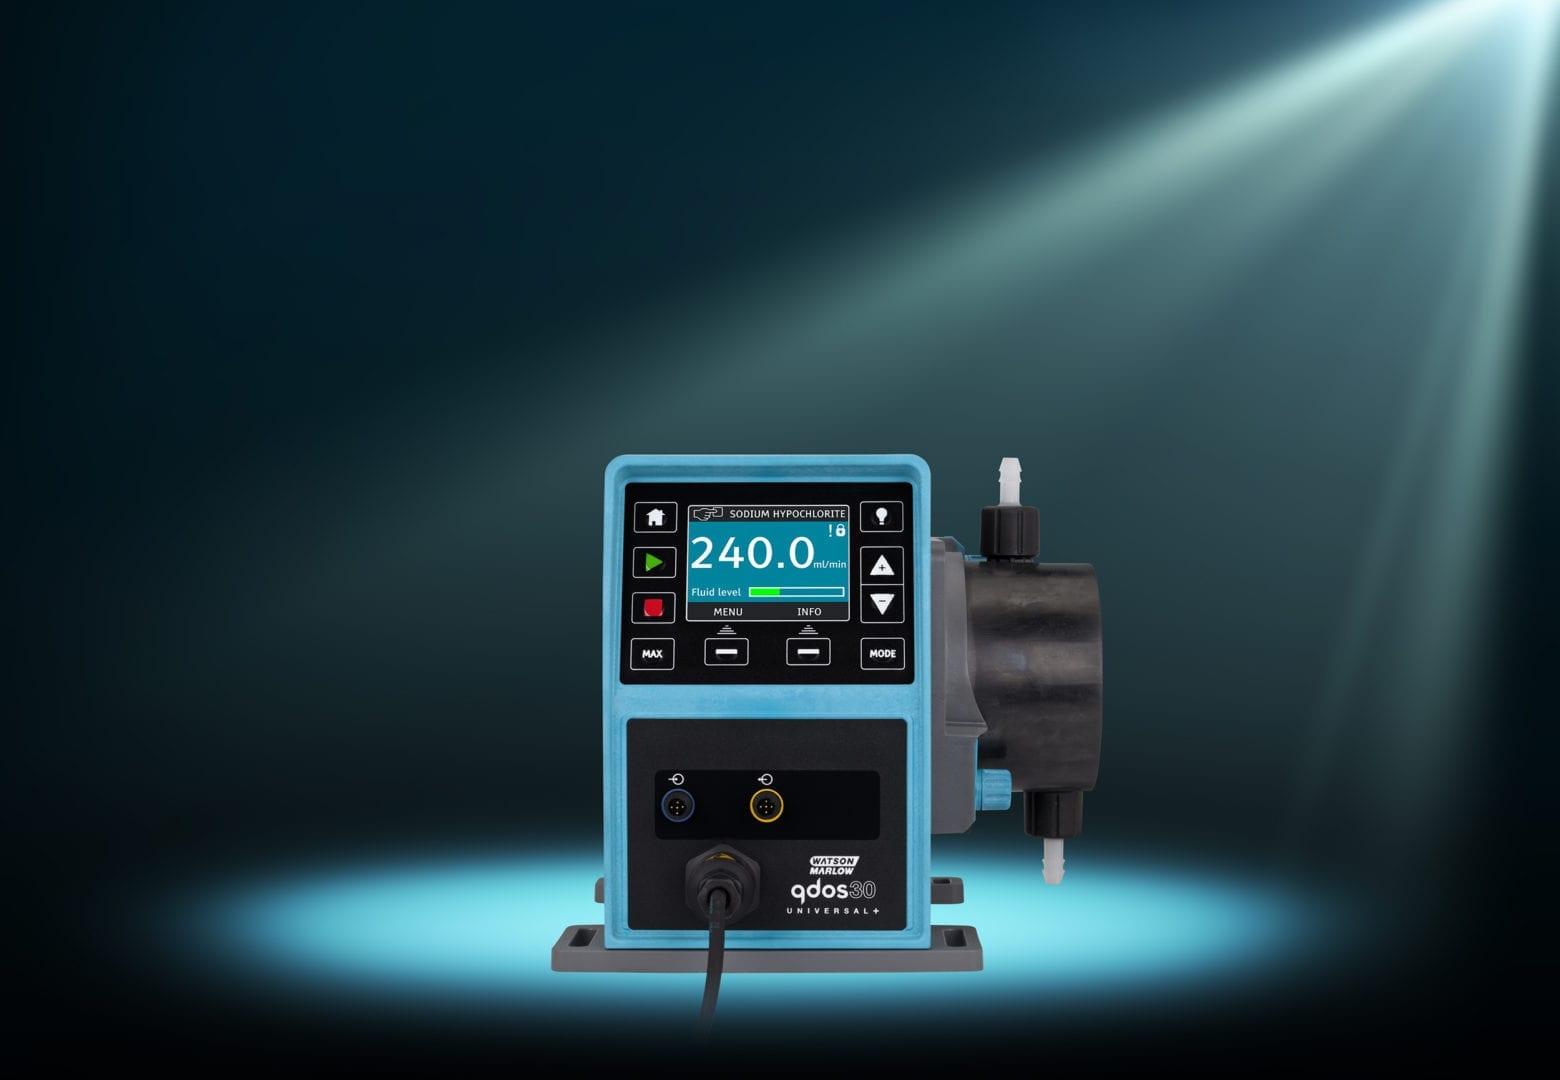 The start of a no-valve metering revolution